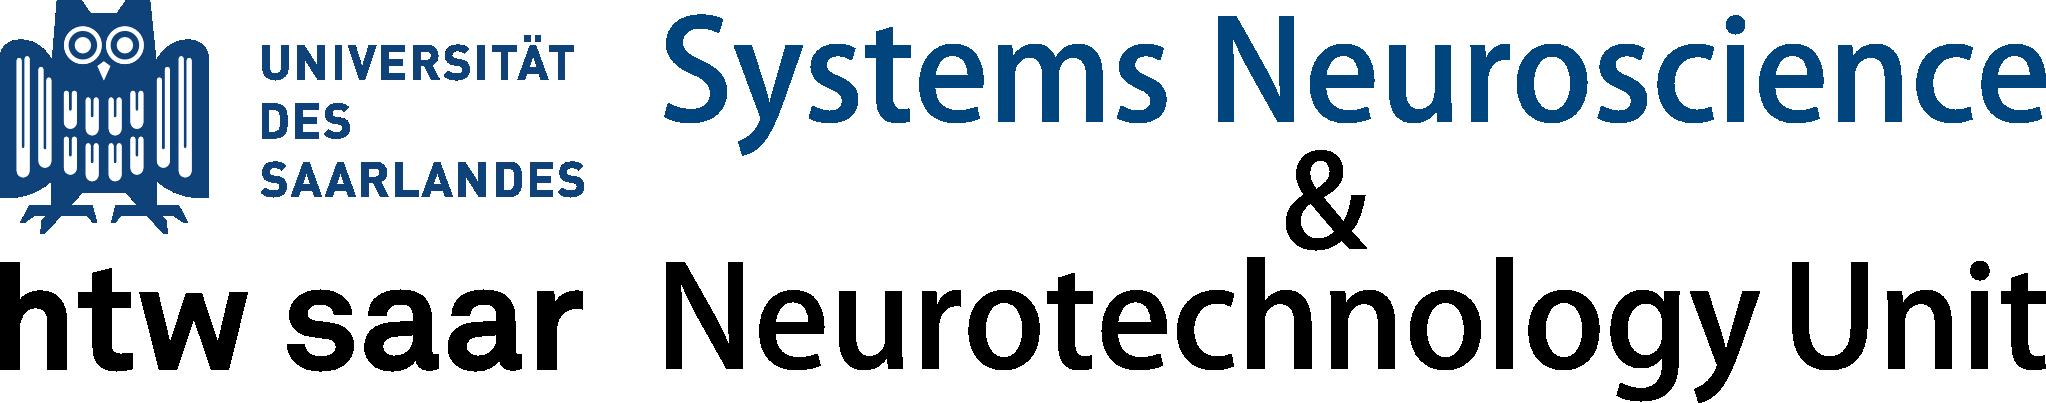 Systems Neuroscience & Neurotechnology Unit